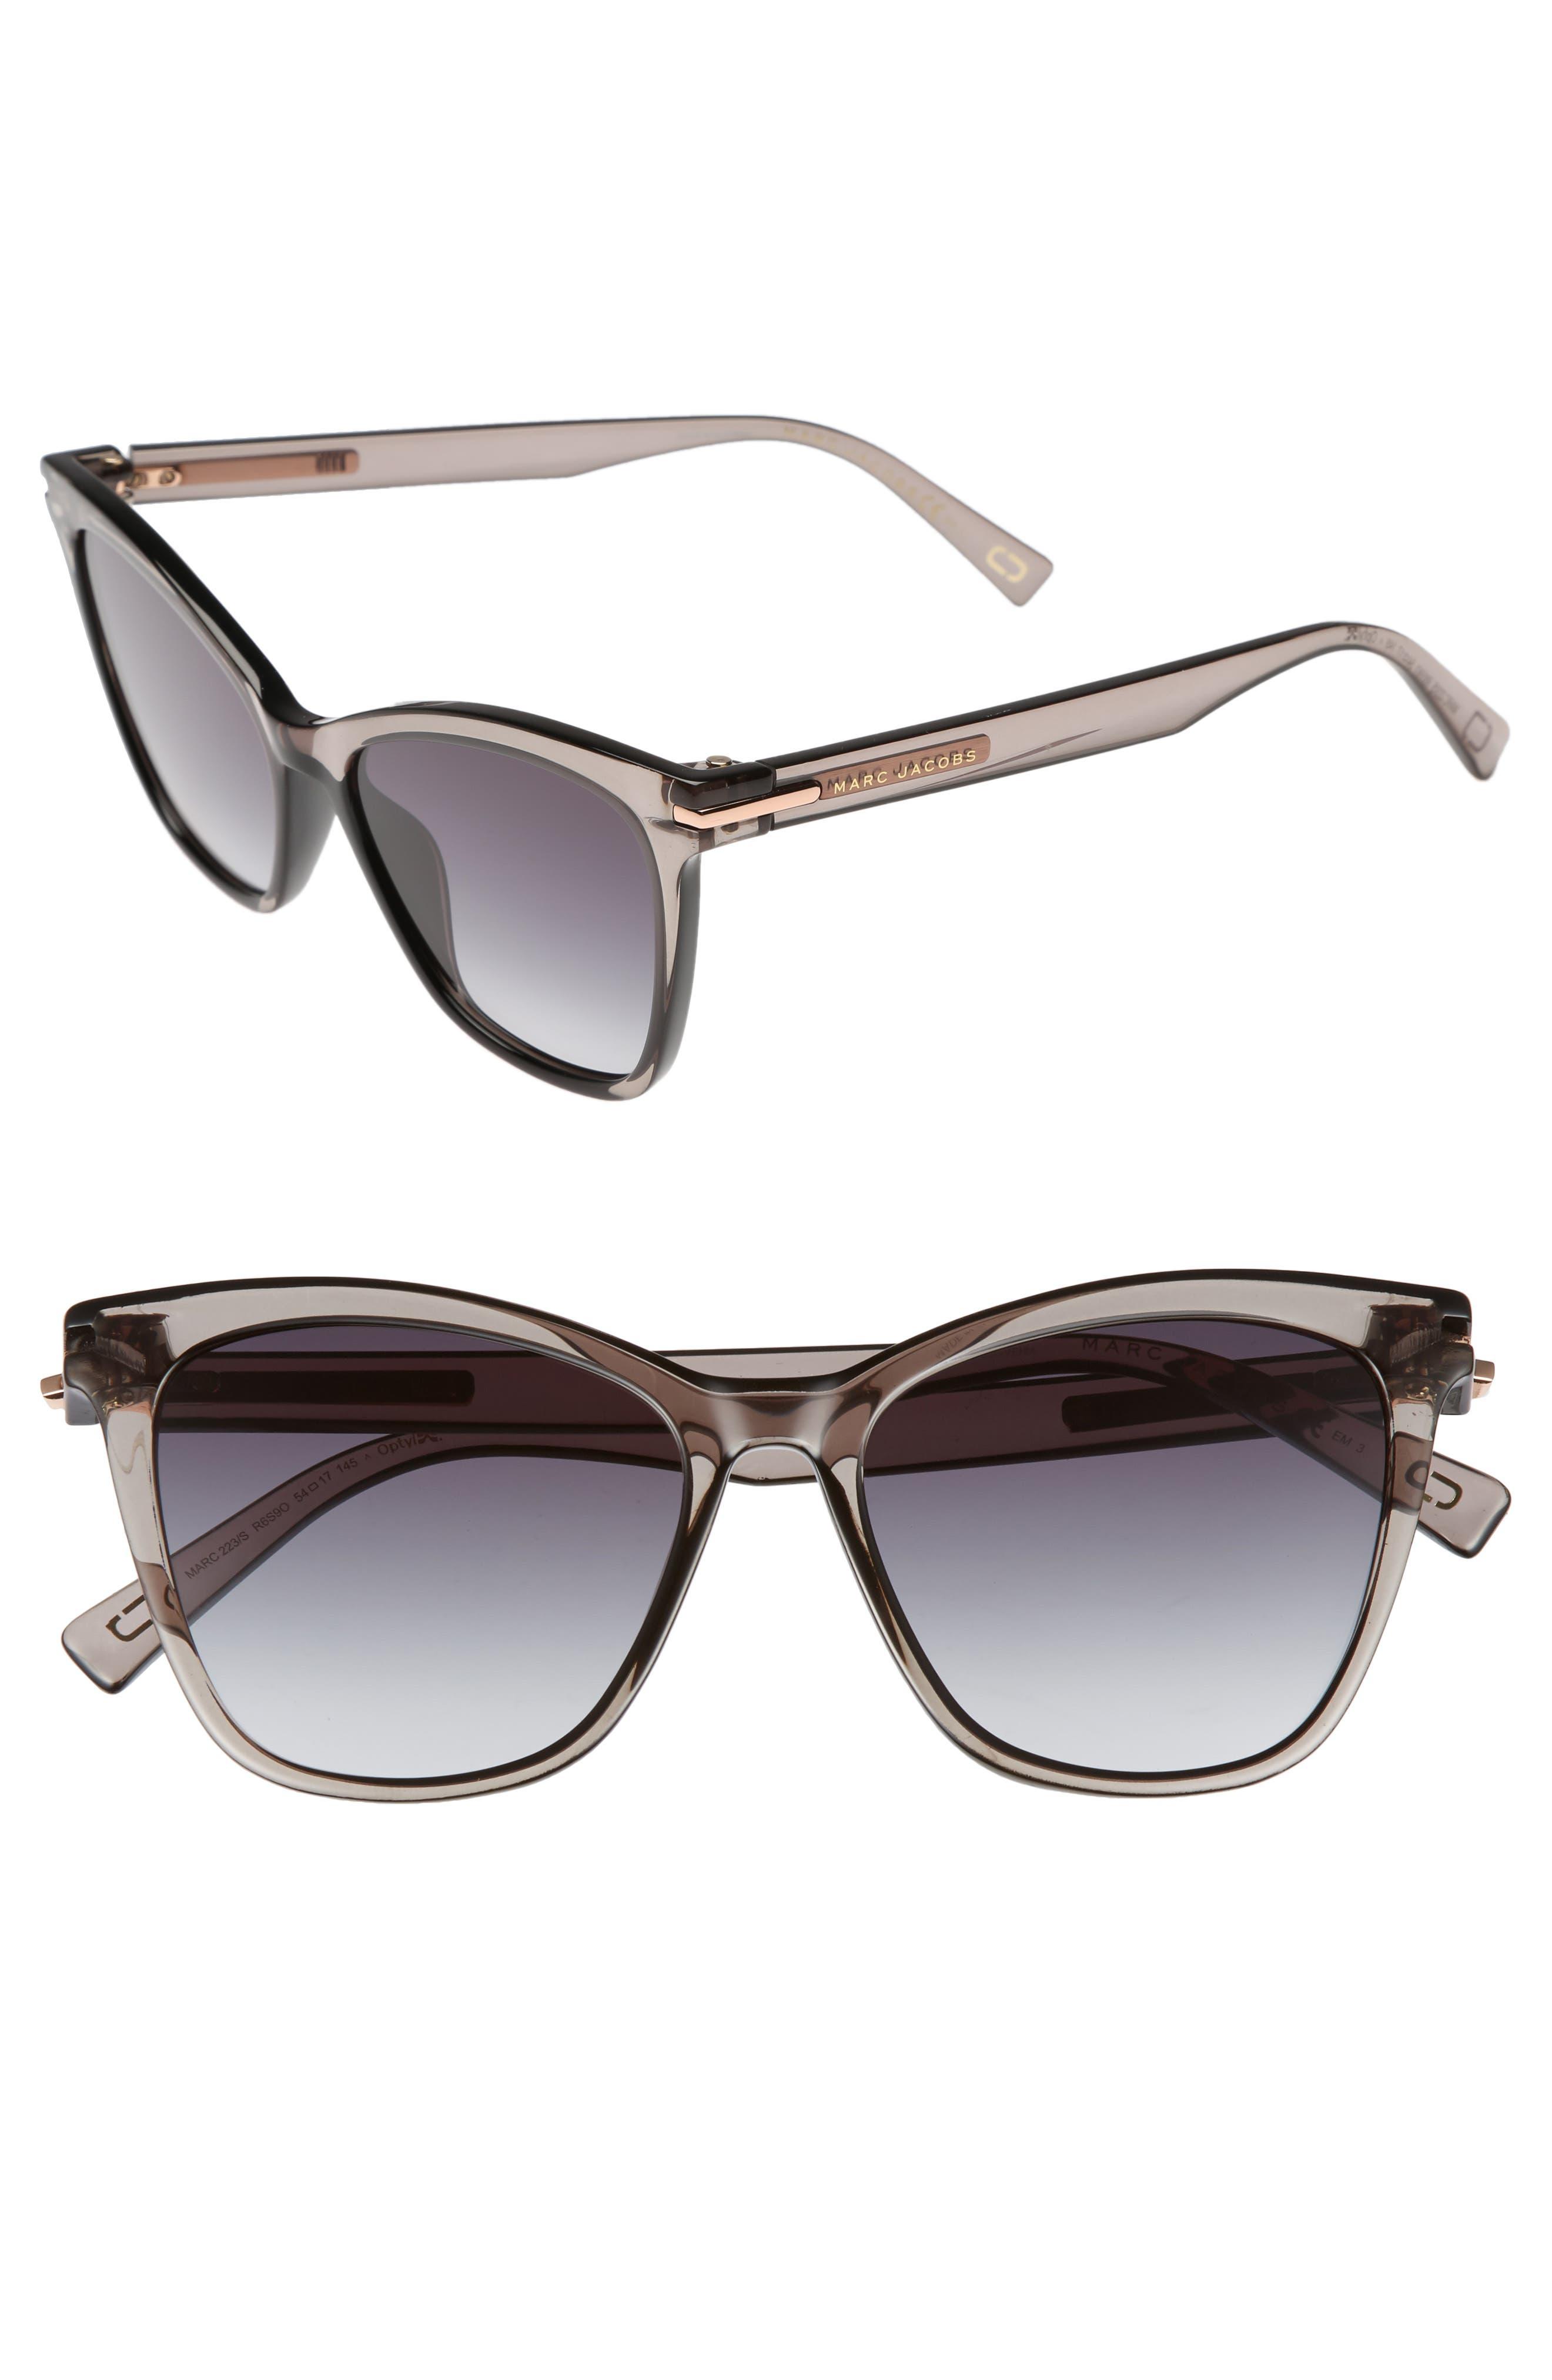 2446e81f0d785 MARC JACOBS Sunglasses for Women